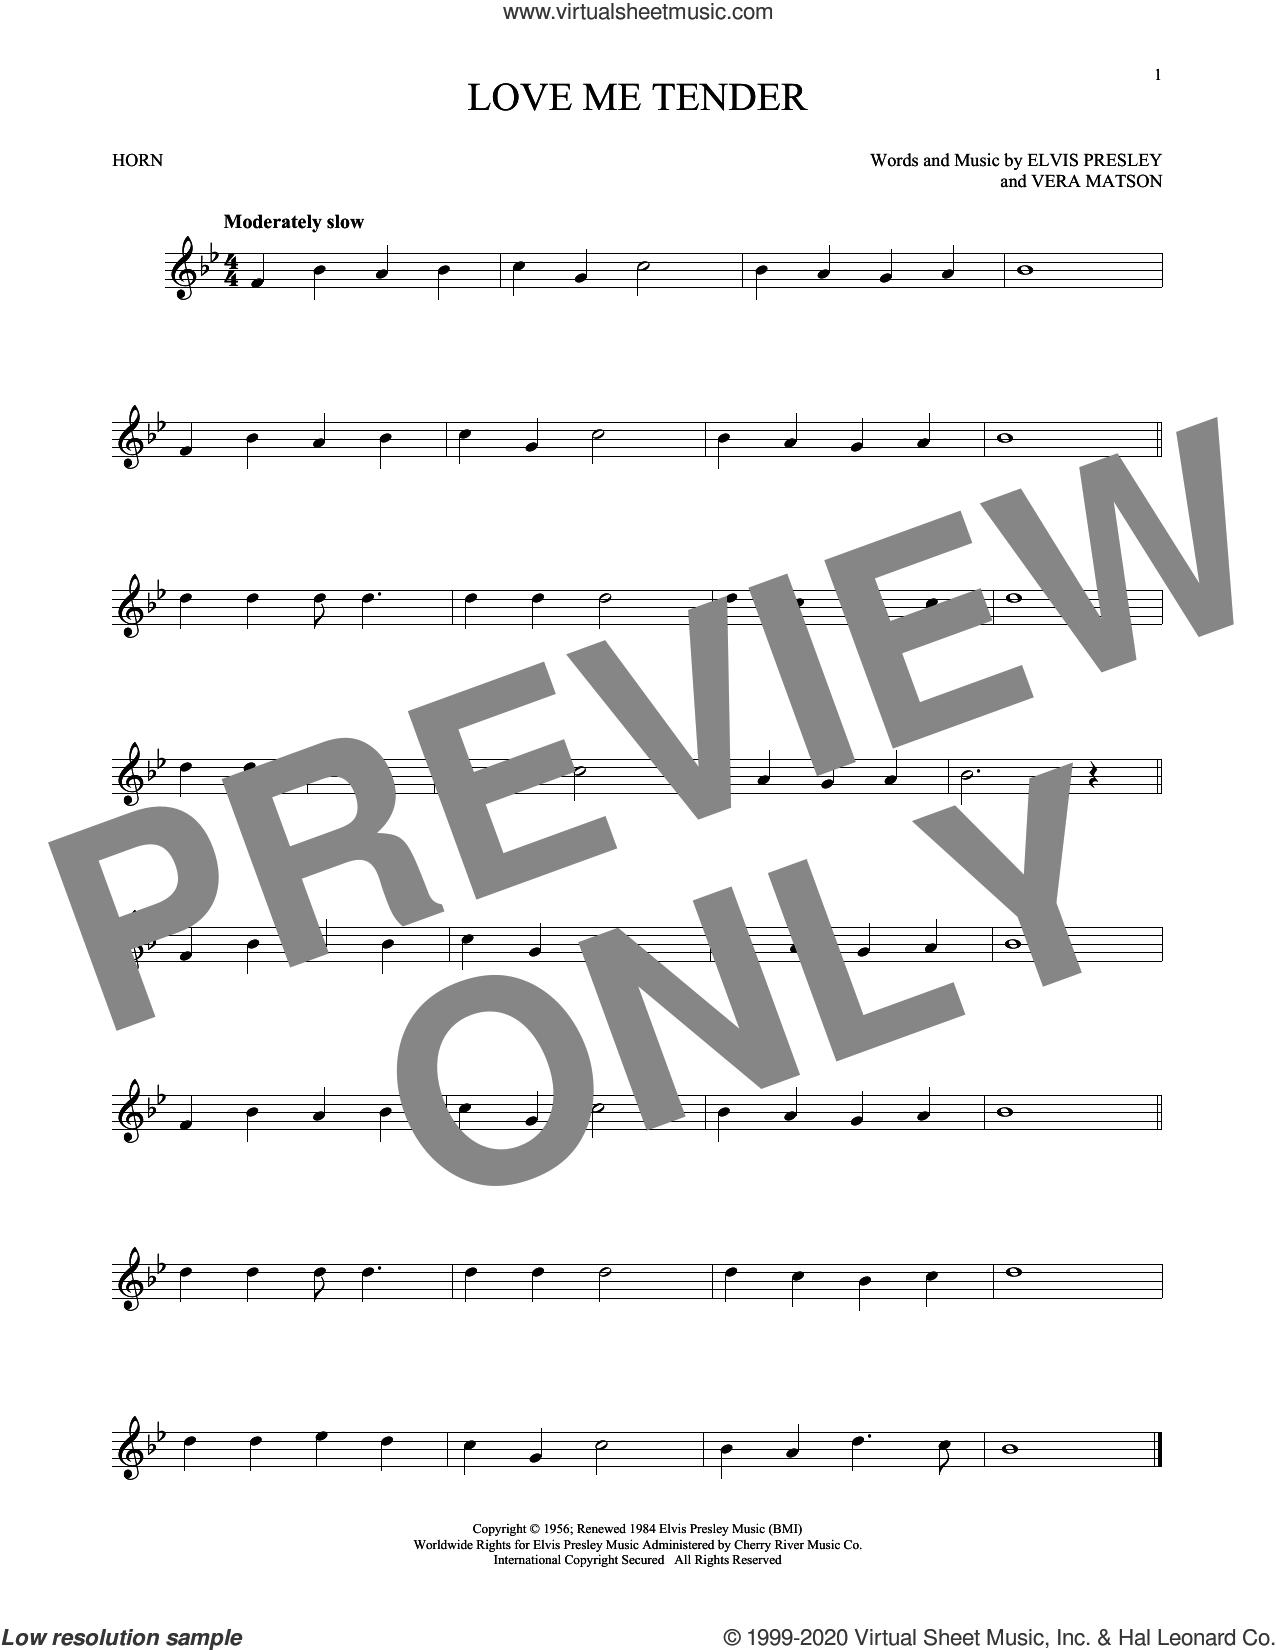 Love Me Tender sheet music for horn solo by Elvis Presley and Vera Matson, intermediate skill level